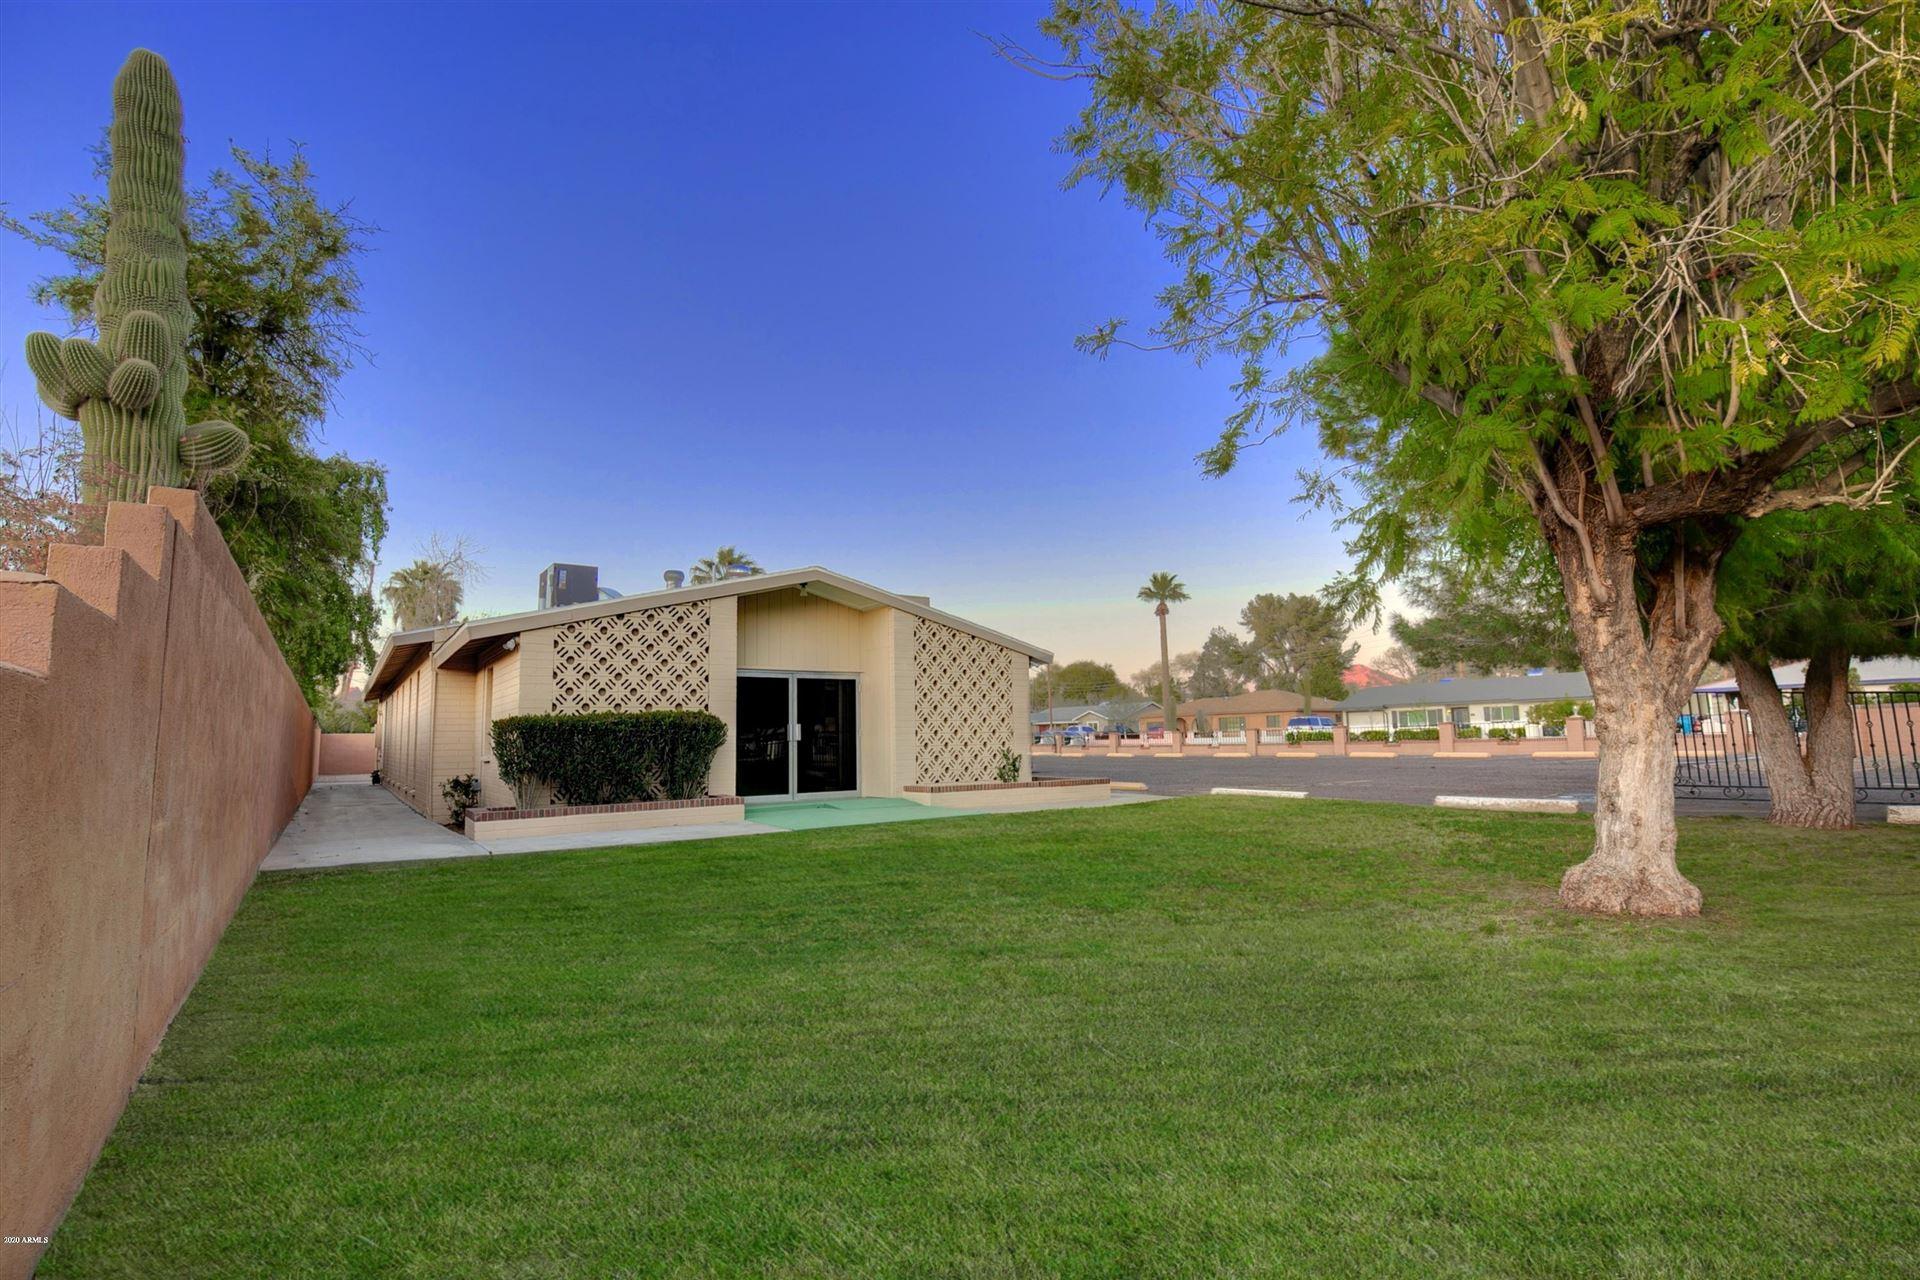 Property Image Of 3308 N 28Th Street In Phoenix, Az